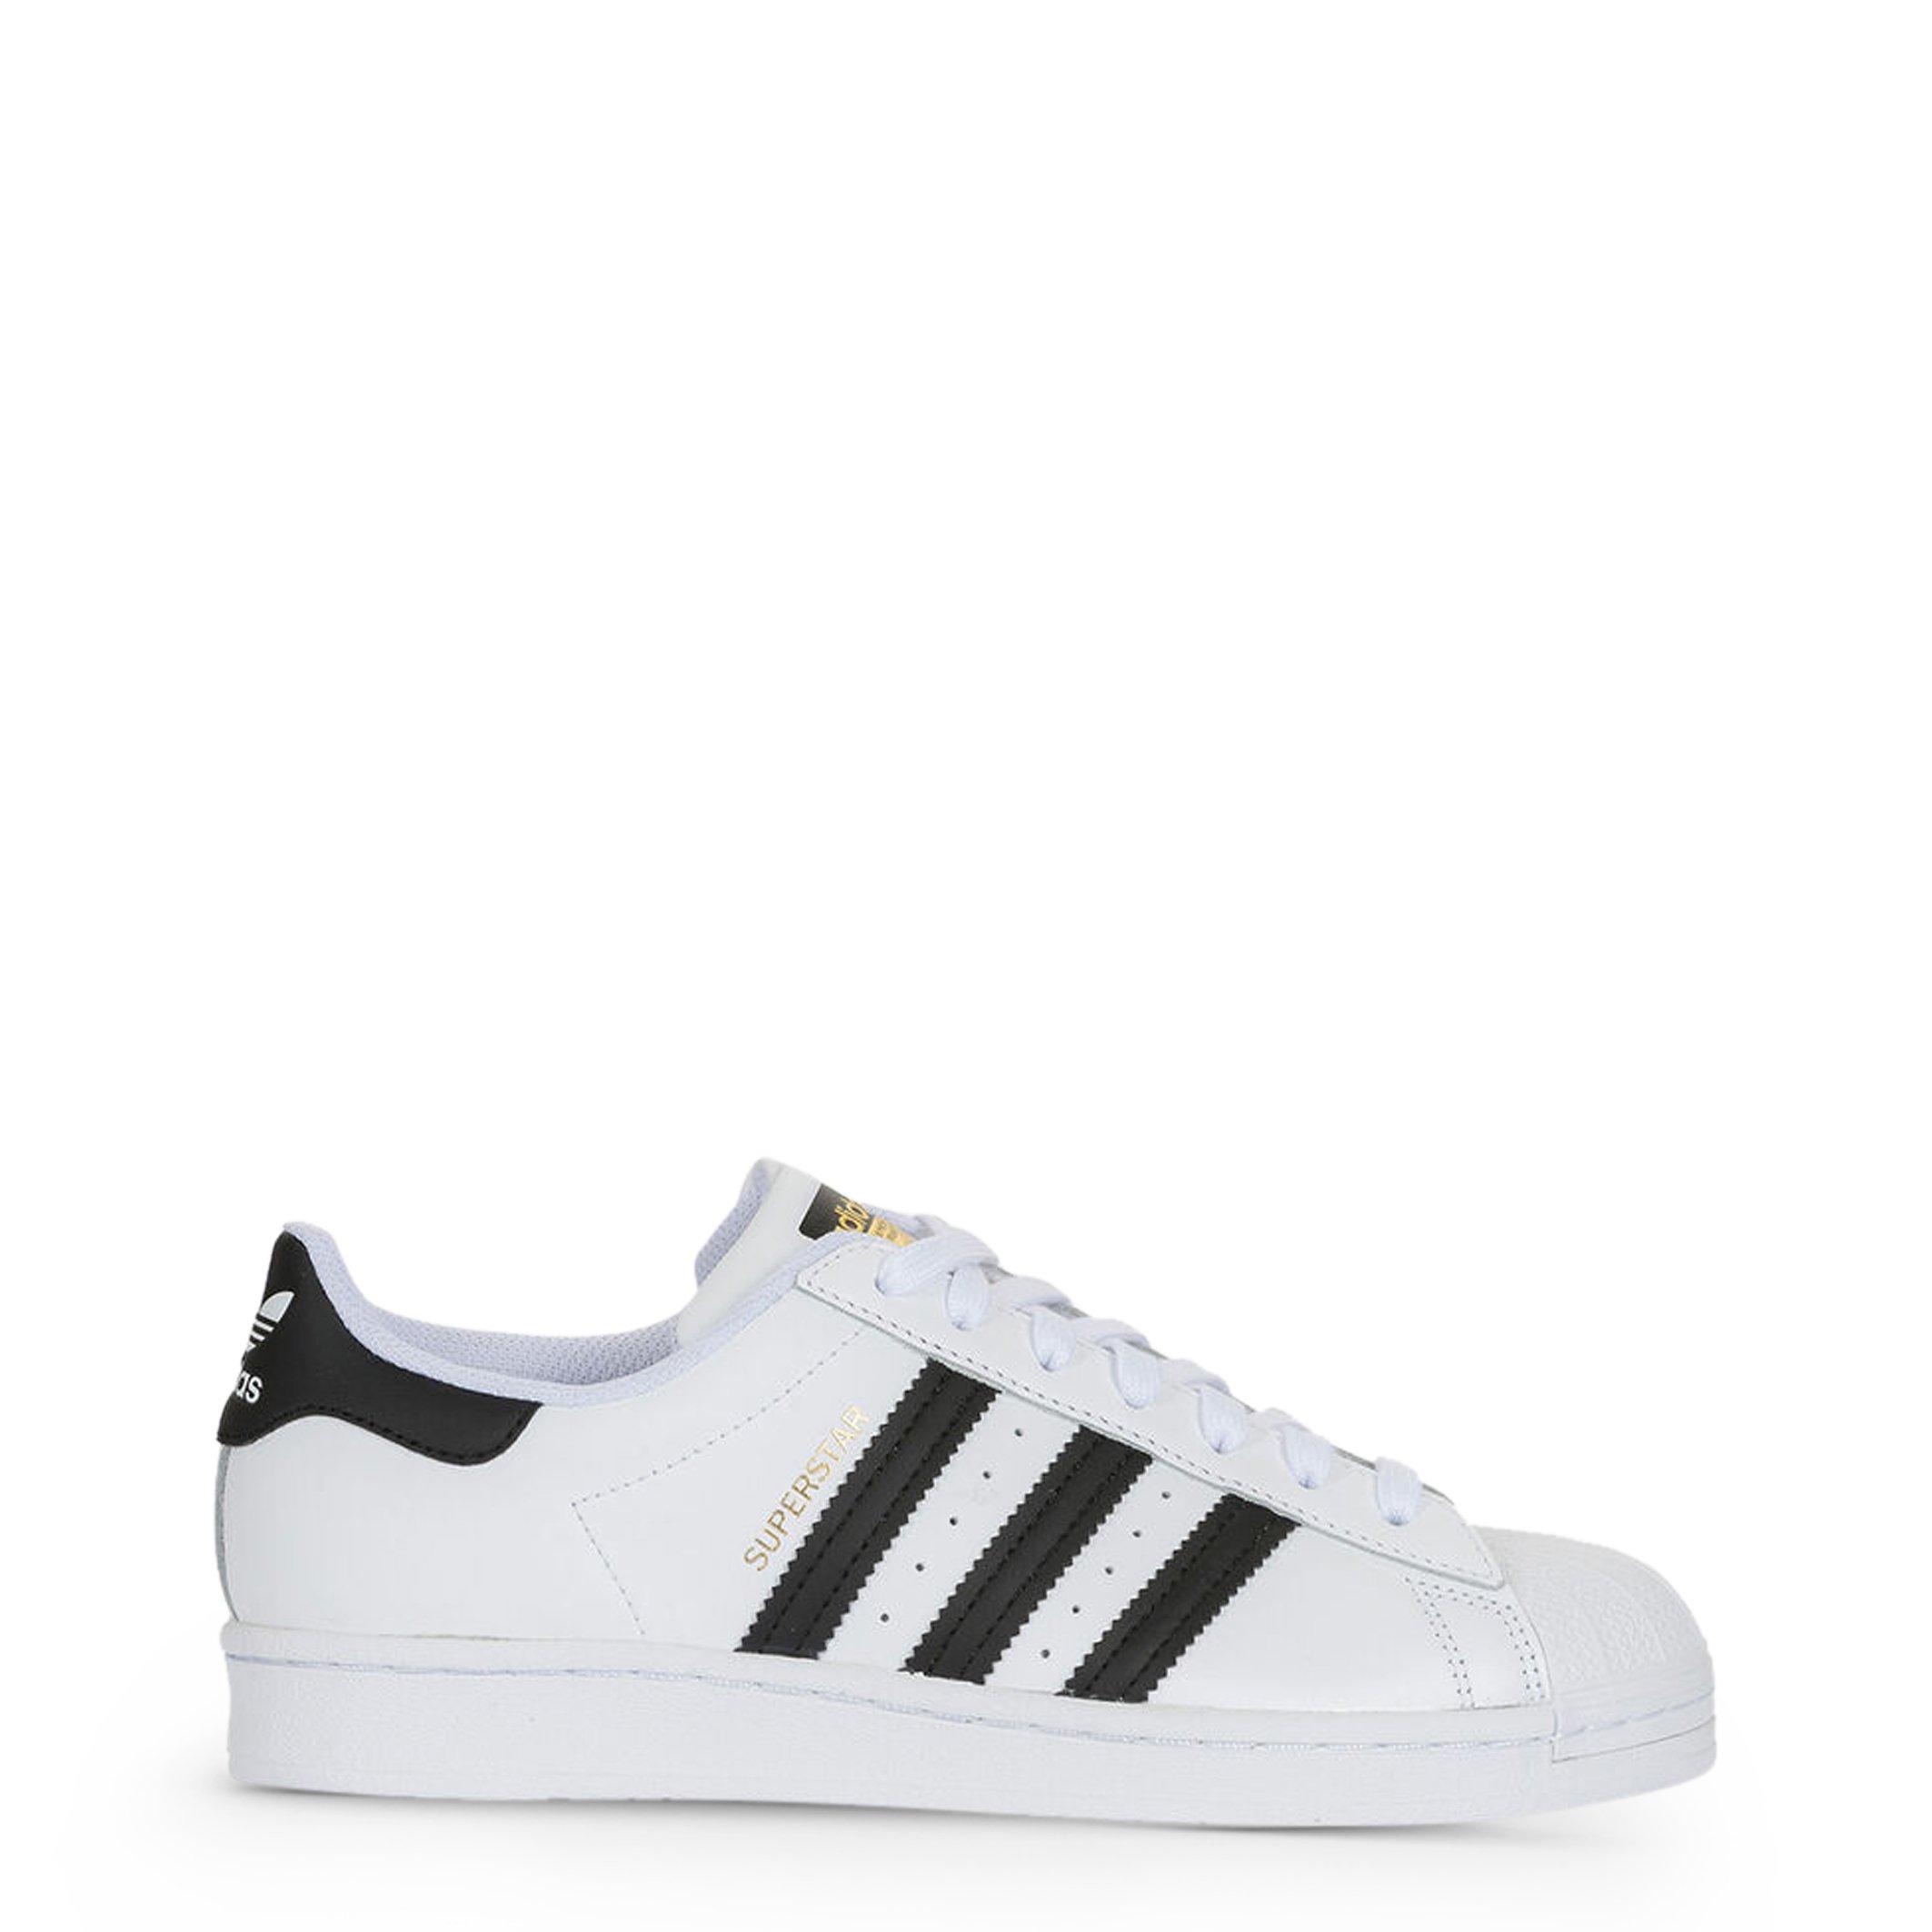 Adidas Women's Trainer Various Colours Superstar - white-5 UK 4.5